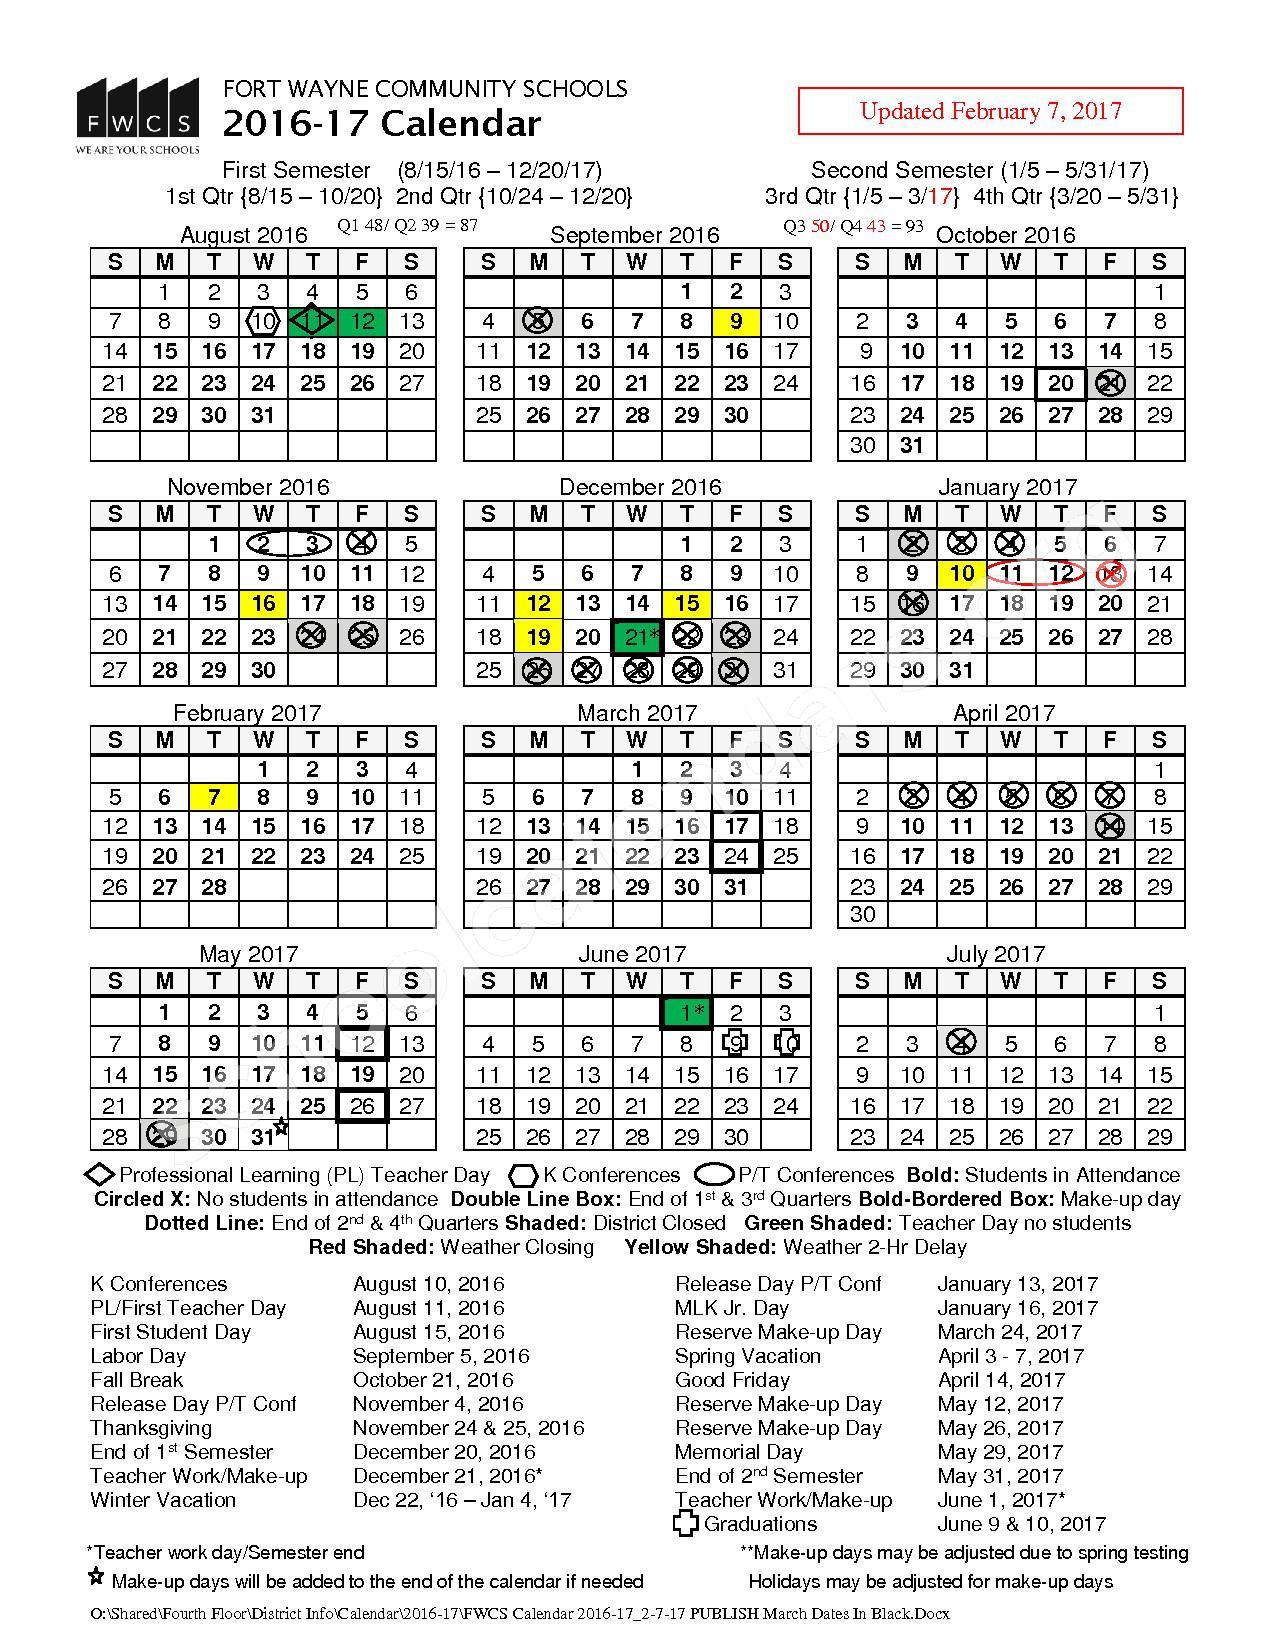 2016- 2017 FWCS School Calendar (Updated) – Fort Wayne Community Schools – page 1